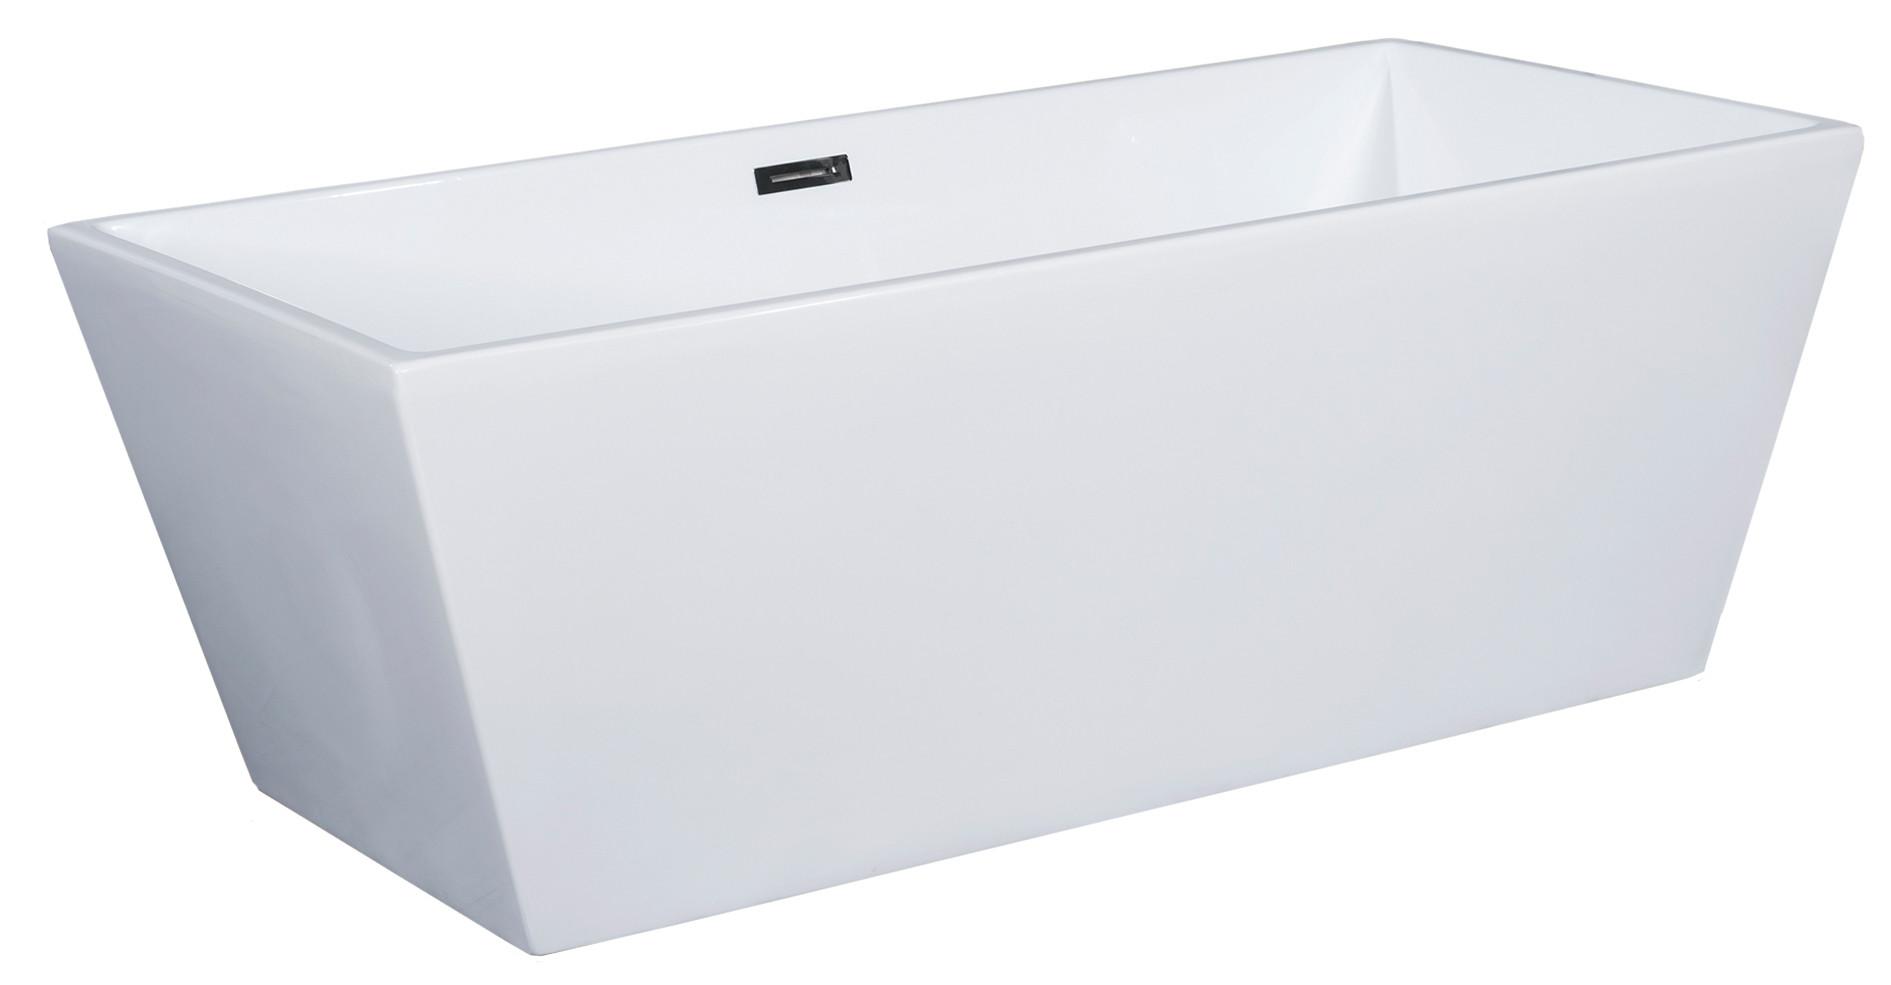 ALFI brand AB833 59 Inch White Rectangular Free Standing Soaking Bathtub